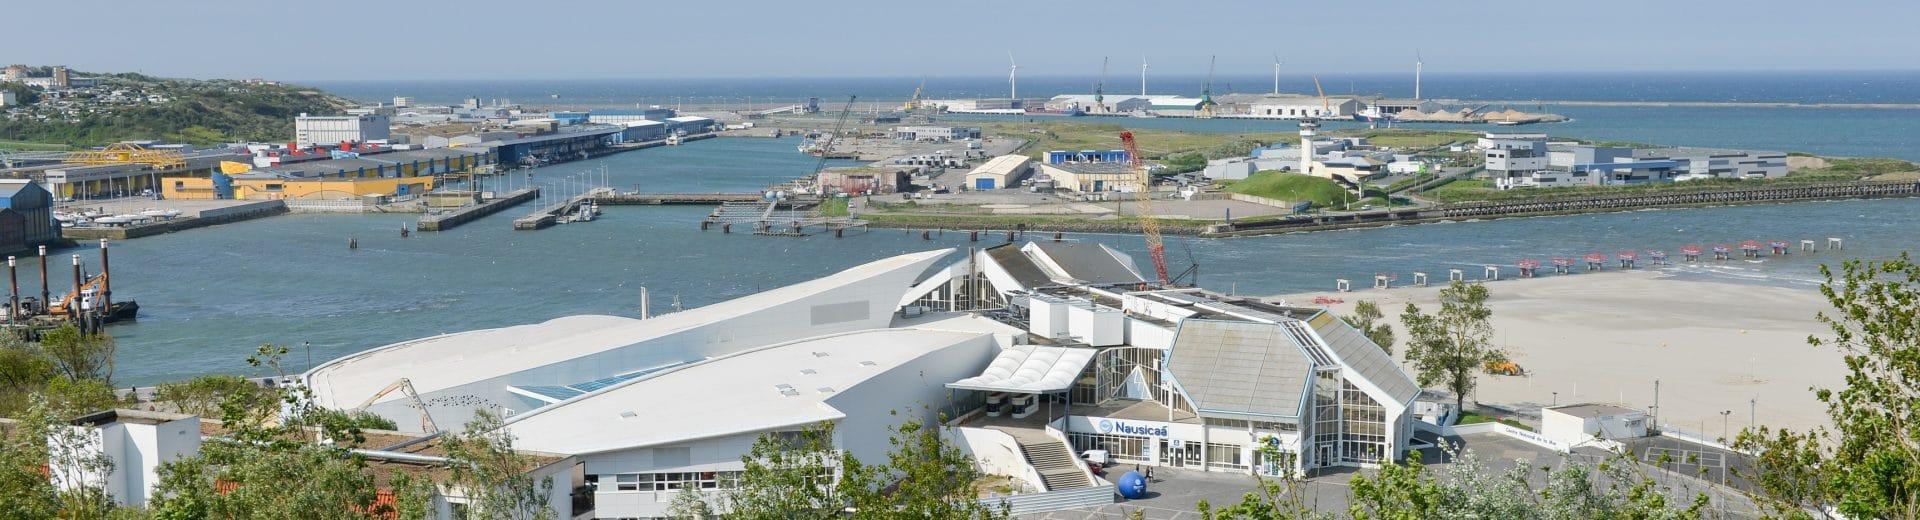 Boulogne panorama Port Nausicaa-1 ©Yannick Cadart